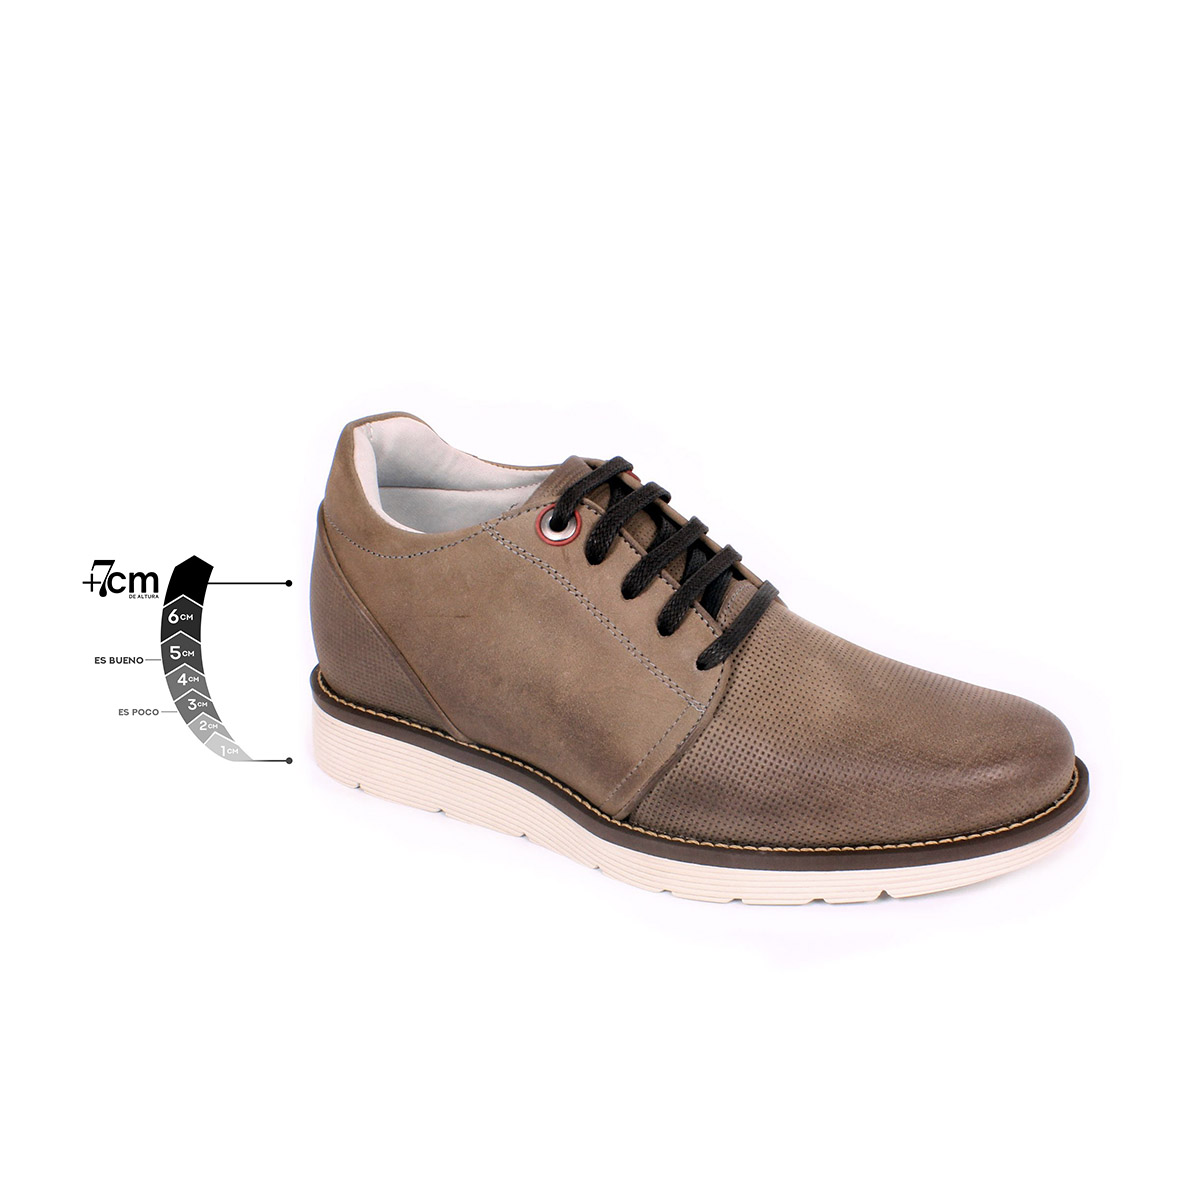 Zapato Casual Avenue Gris Max Denegri +7cms de Altura_75286